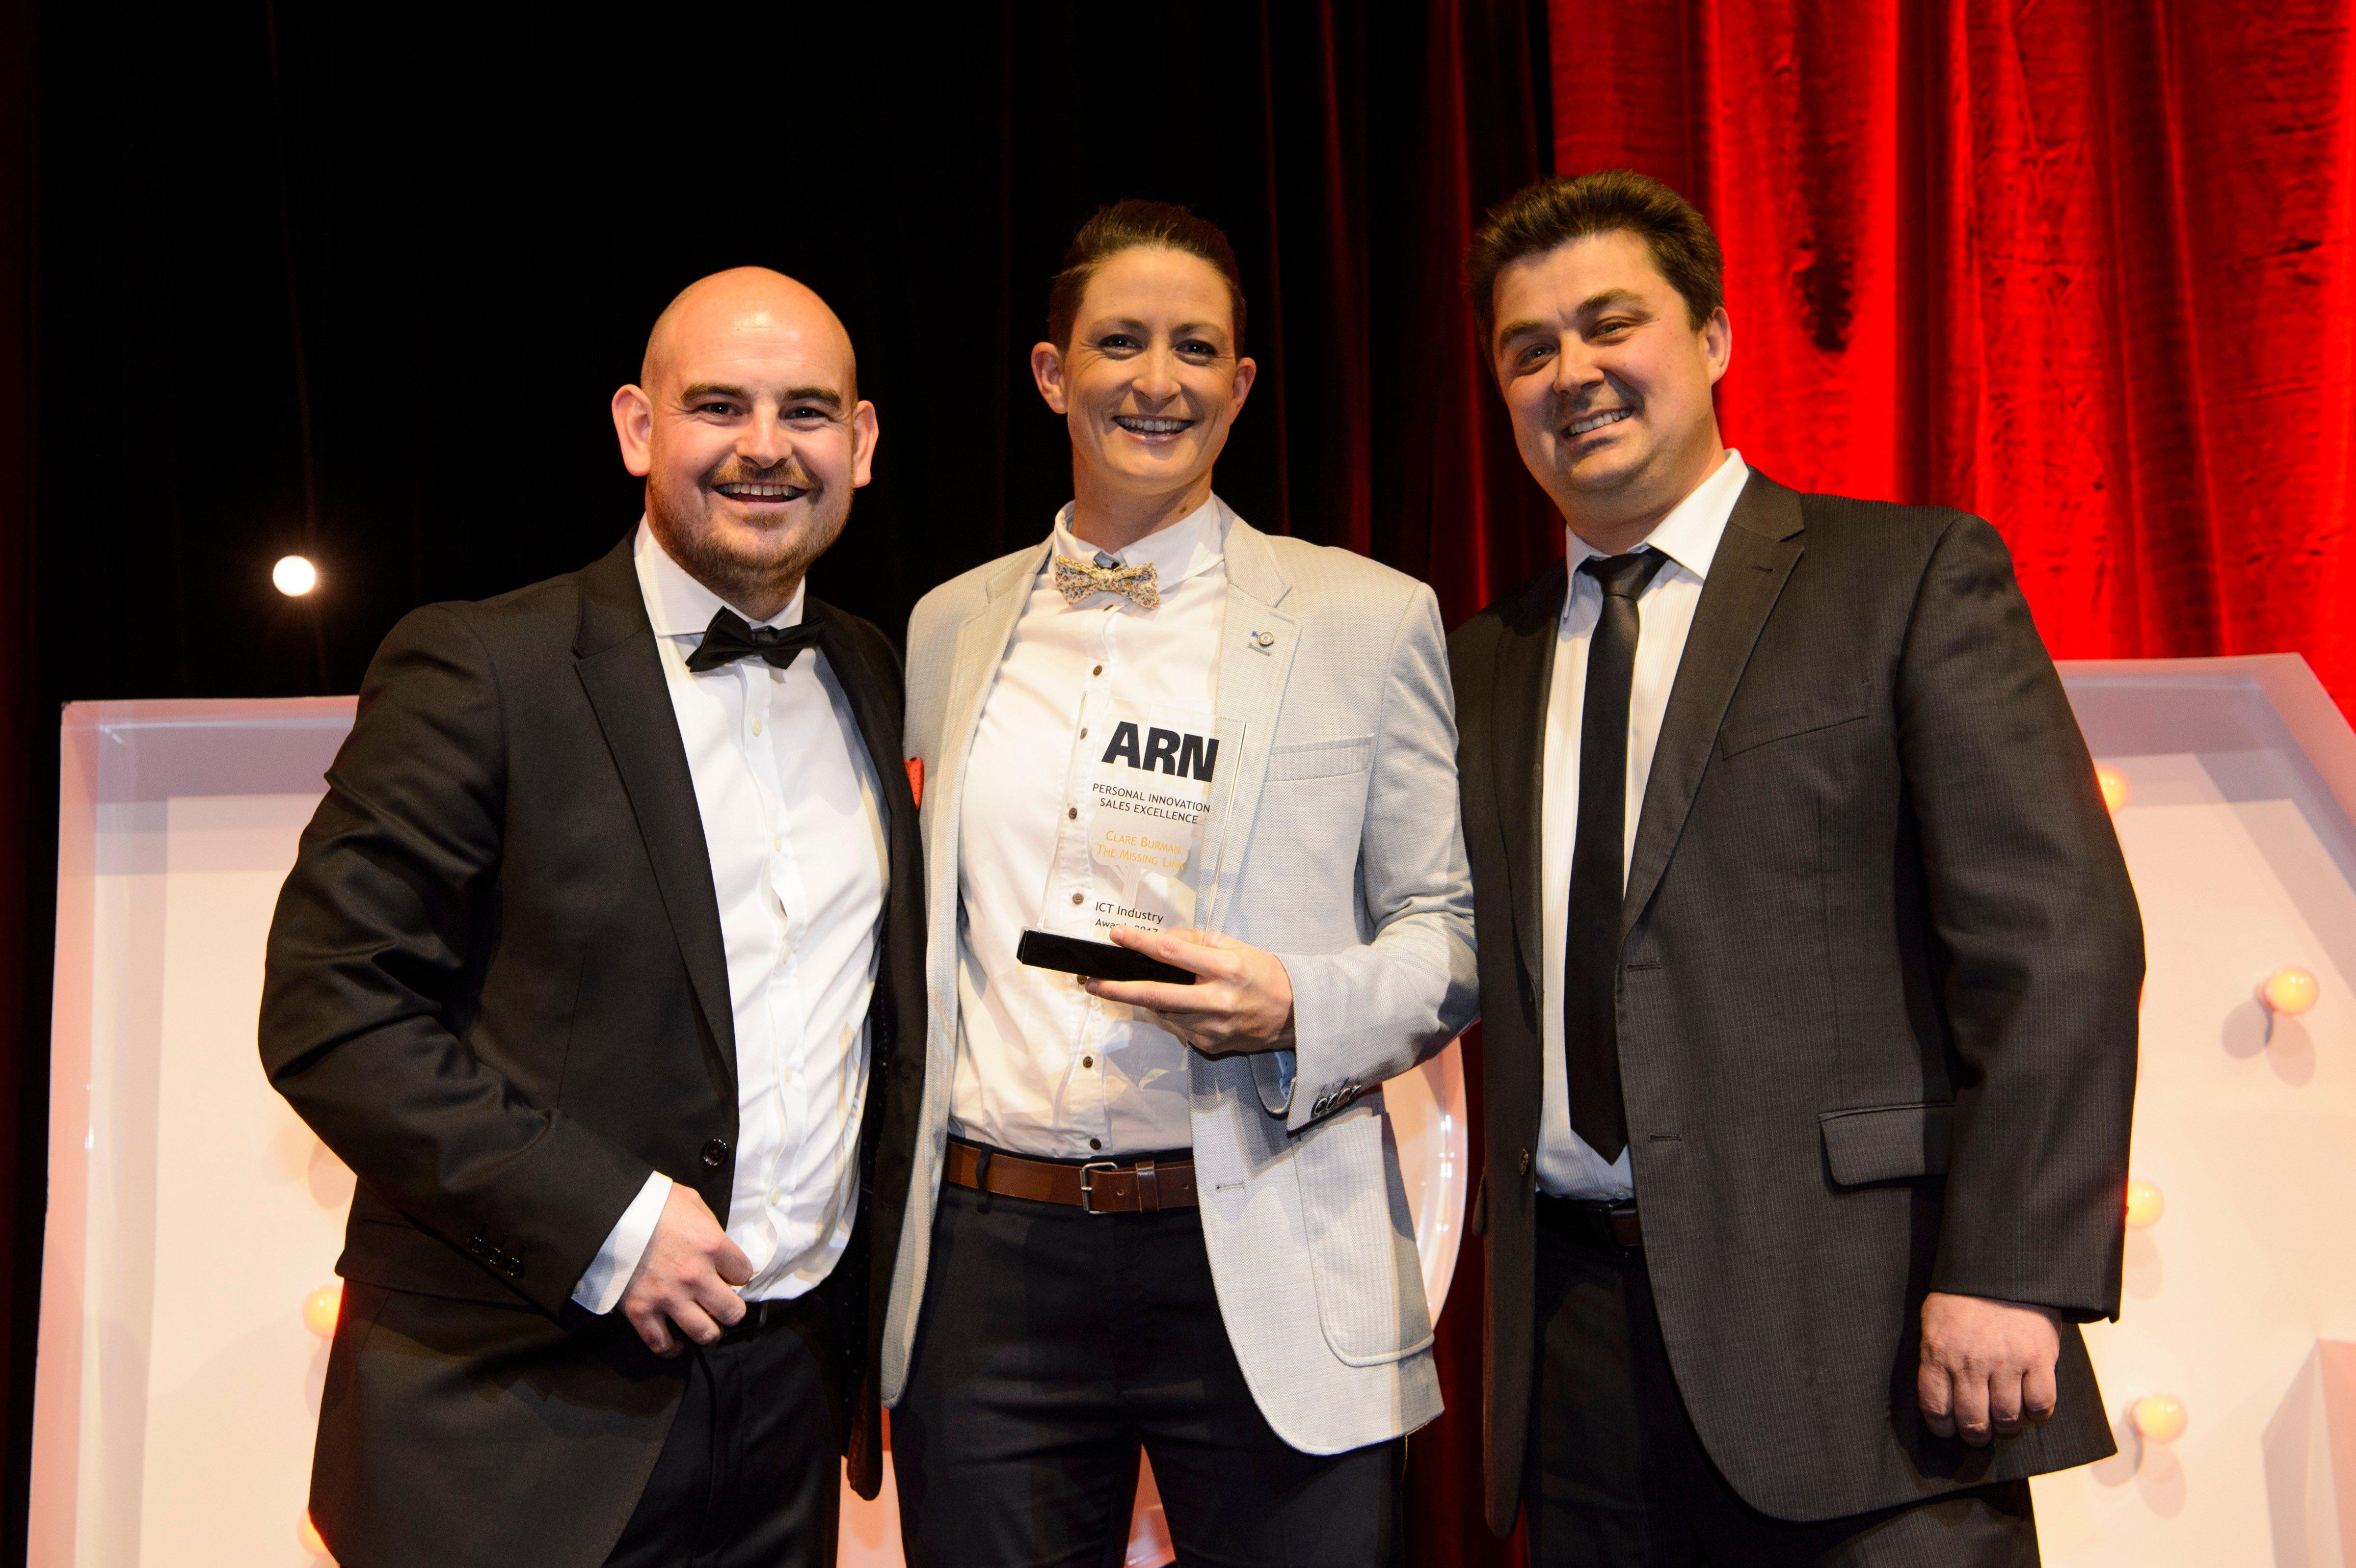 arn_awards-7315